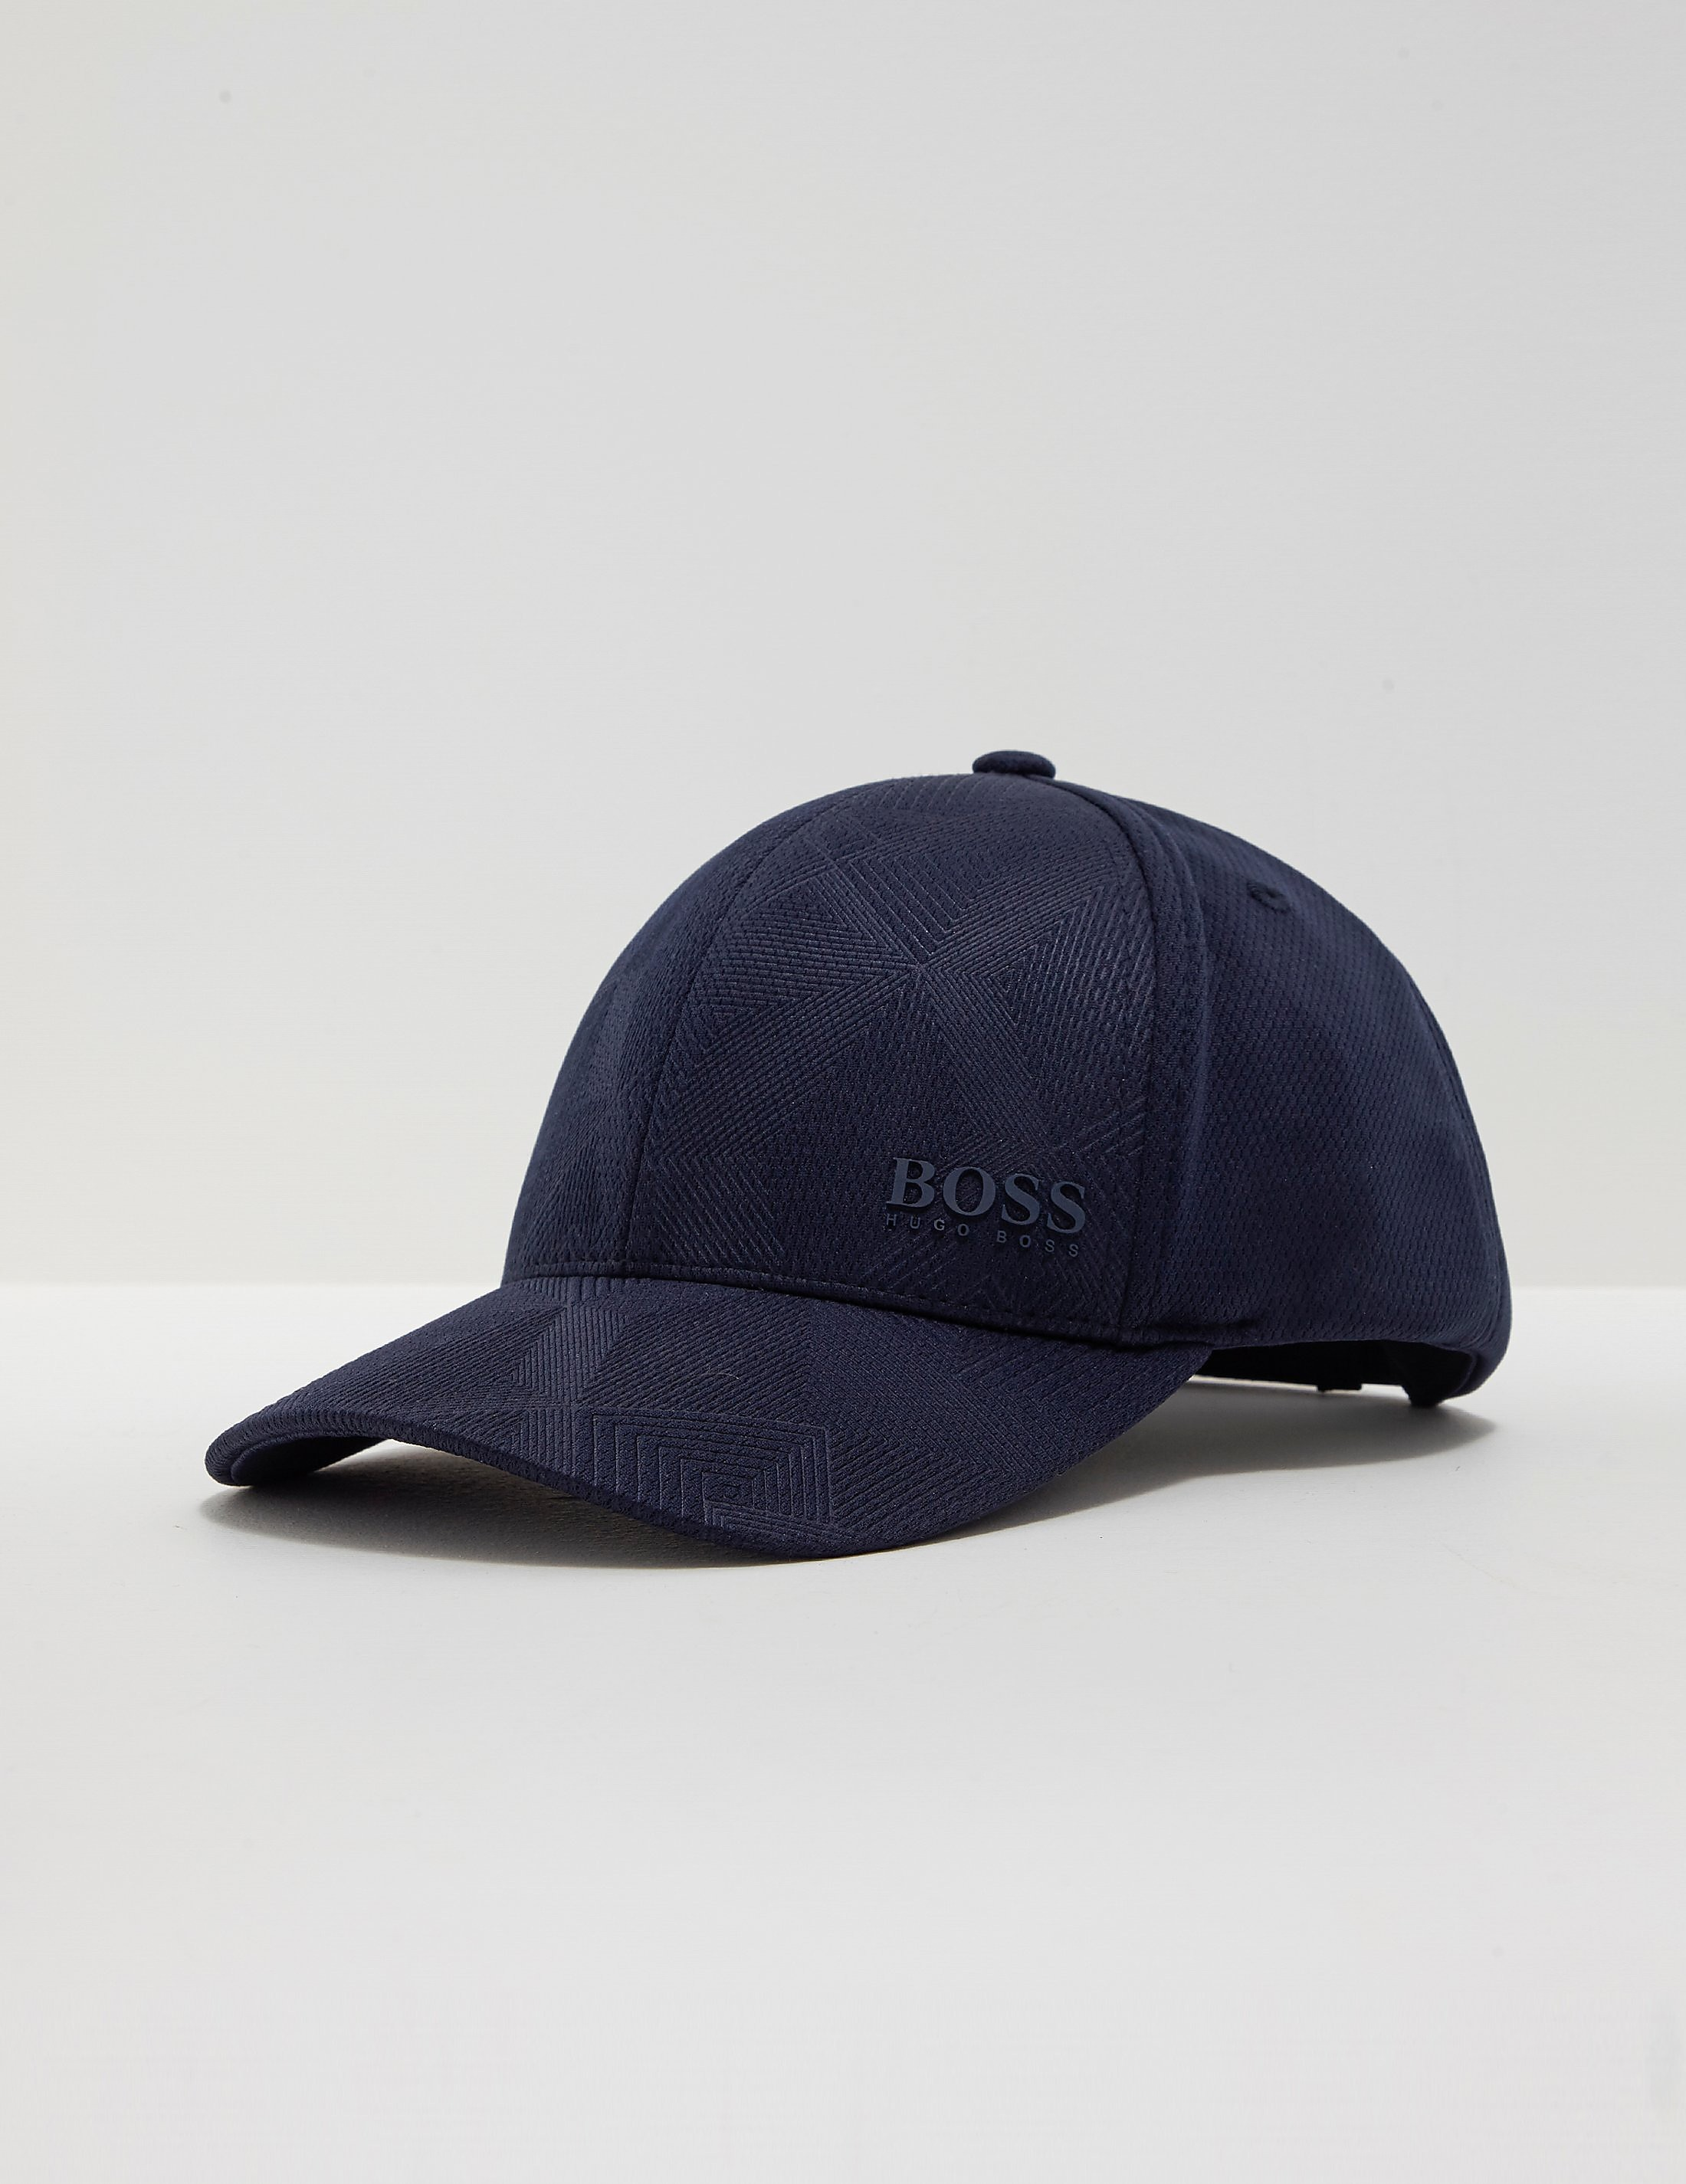 BOSS Green Geometric Print Hat